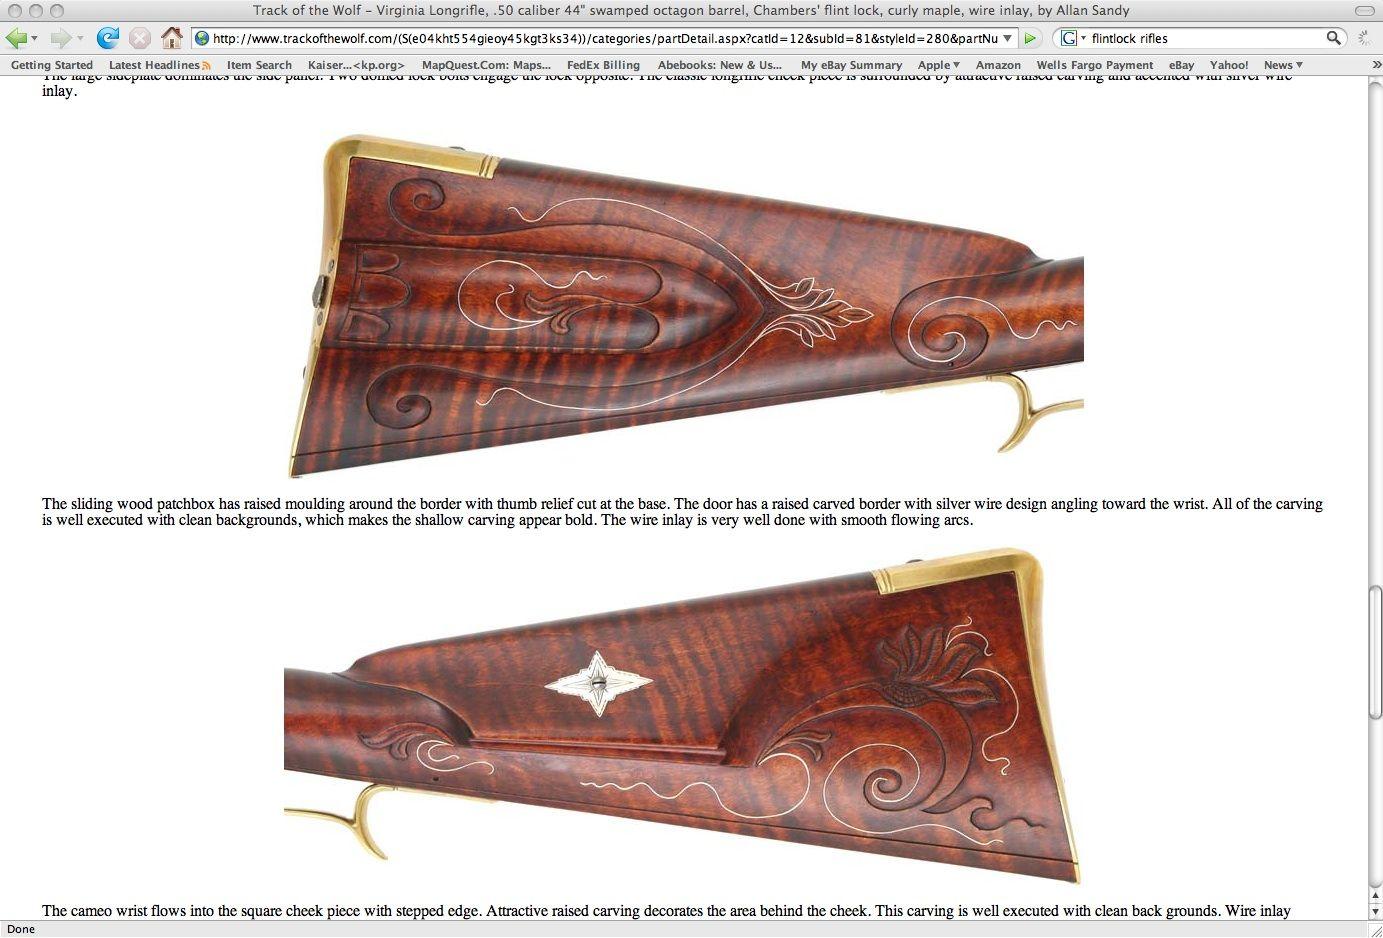 Allan Sandy engraving on butt stock | black powder Rifles